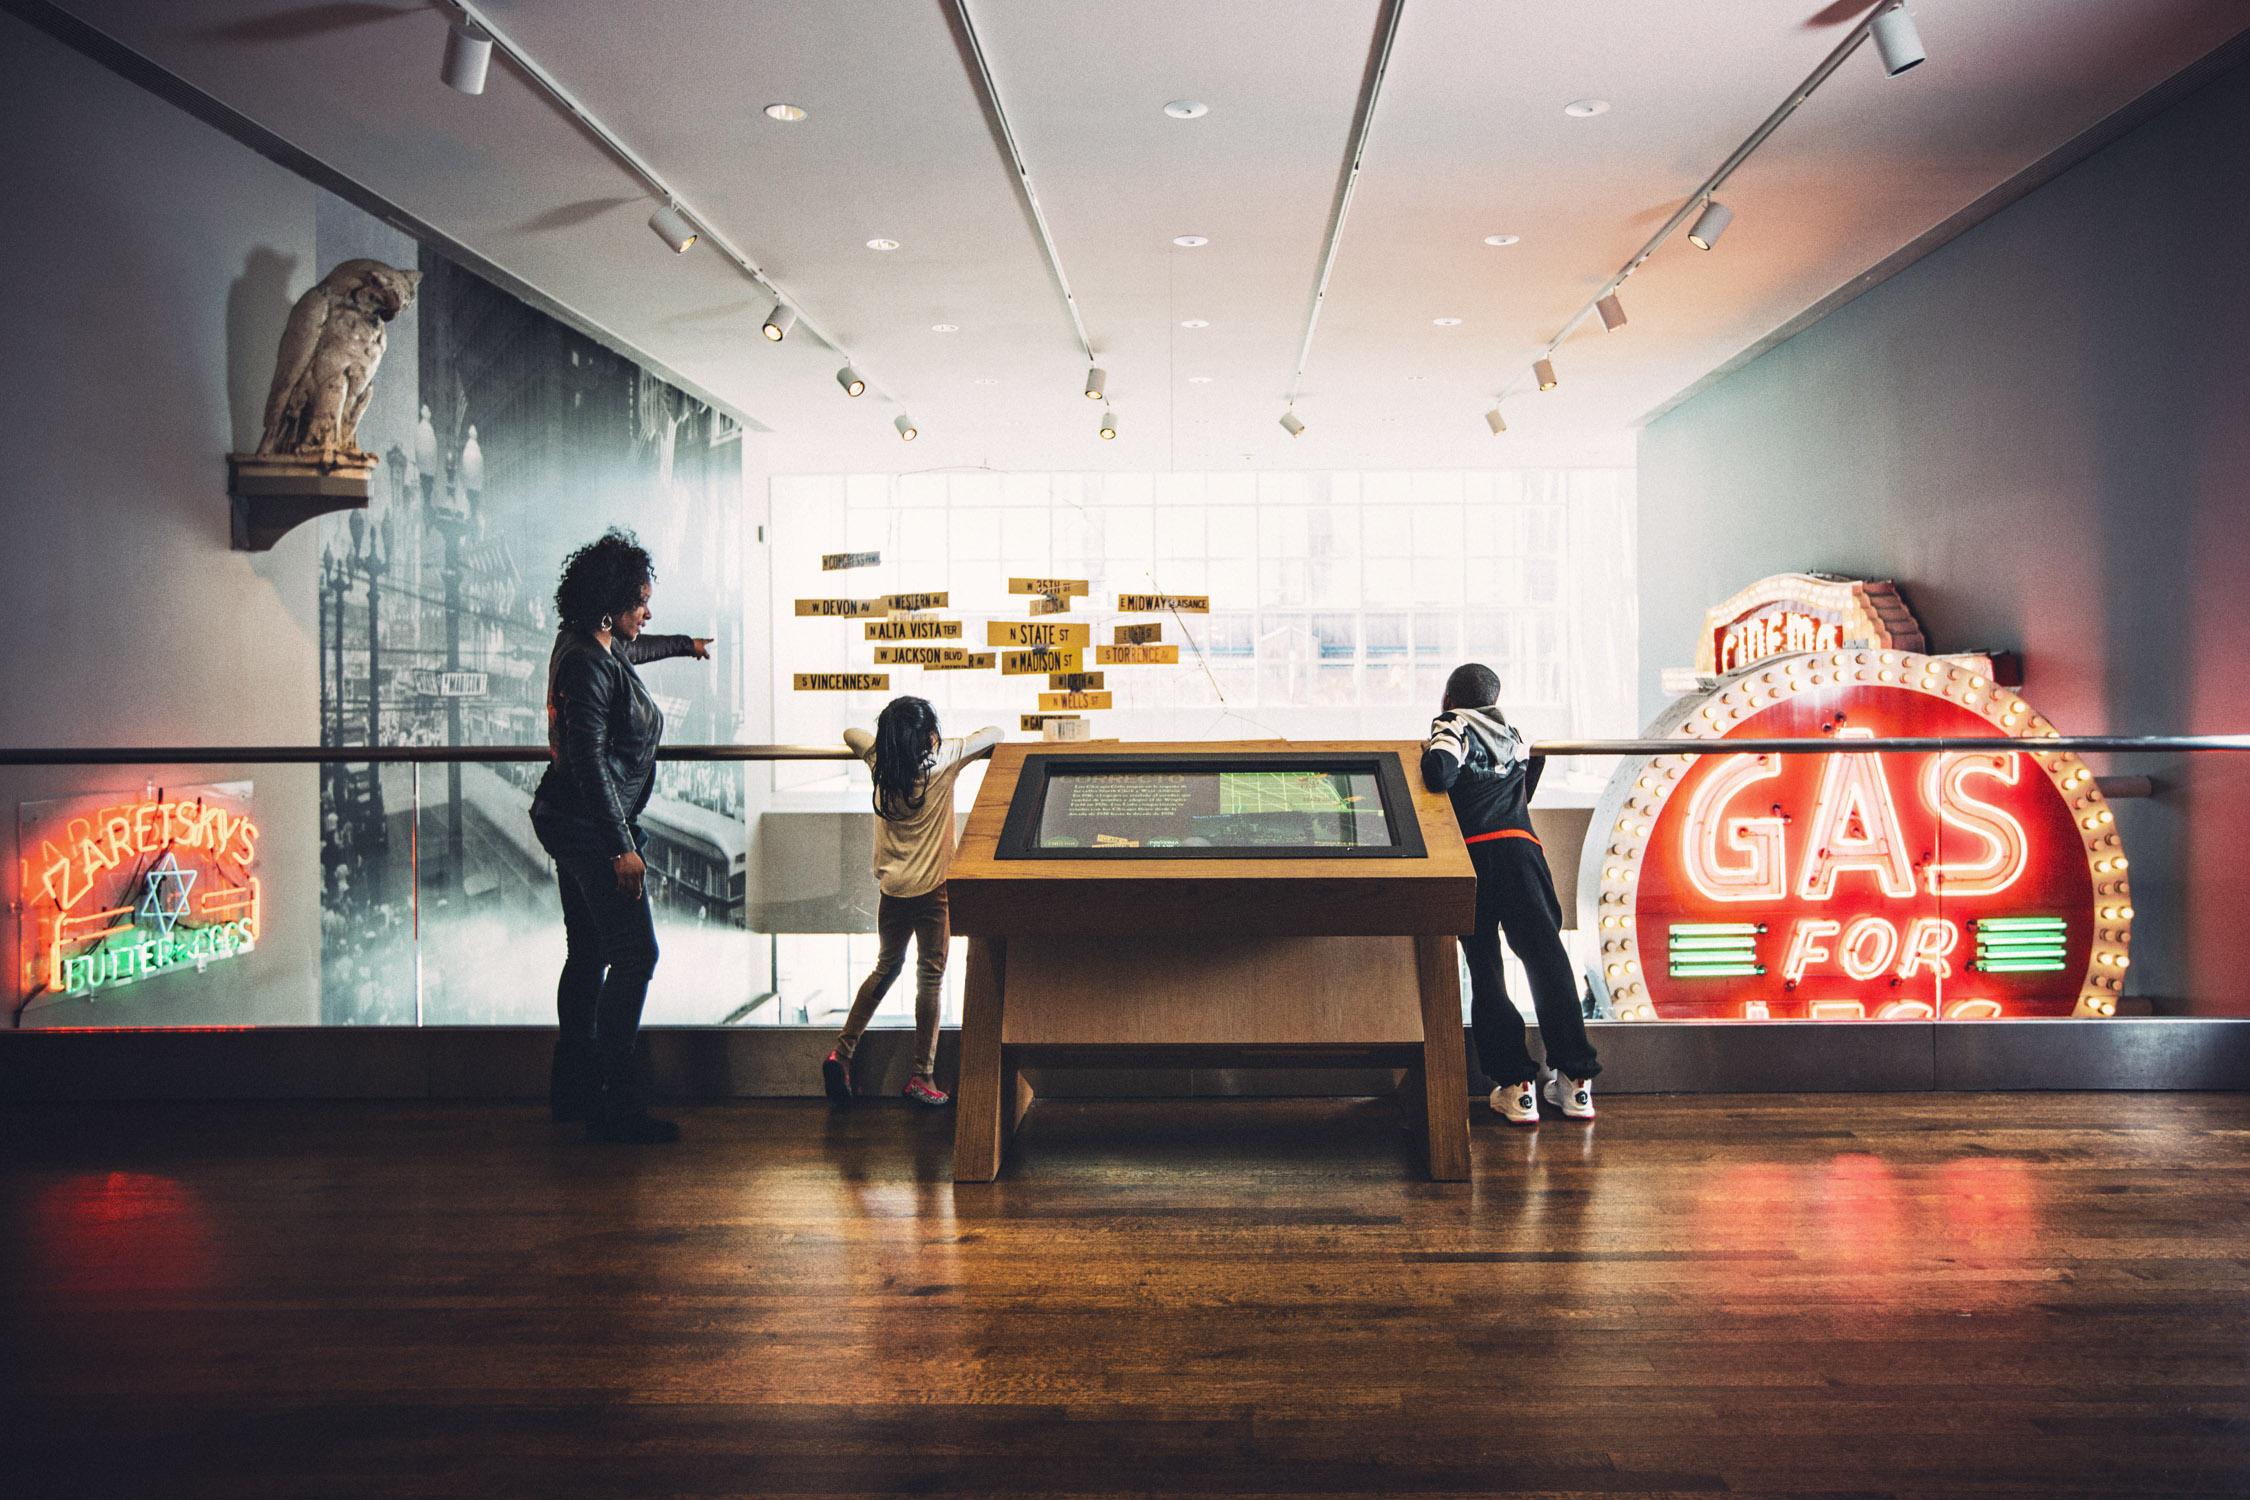 ChooseChicago_HistoryMuseum_1305.jpg